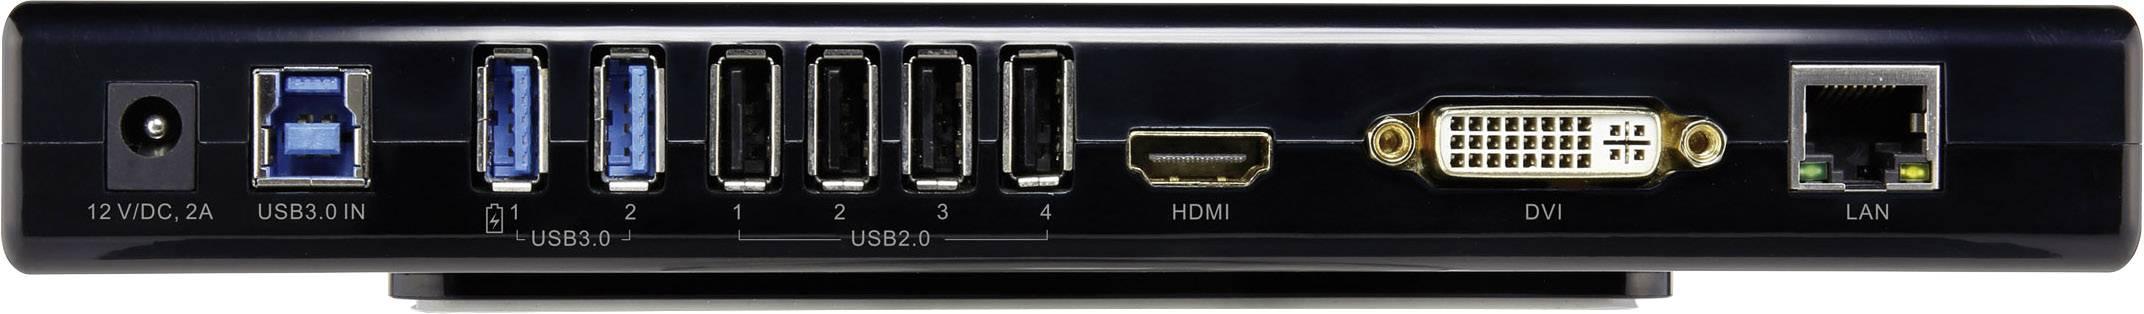 small resolution of renkforcelaptop docking stationuniversal 2x usb 3 0 4x usb 2 0 1x hdmi headphones